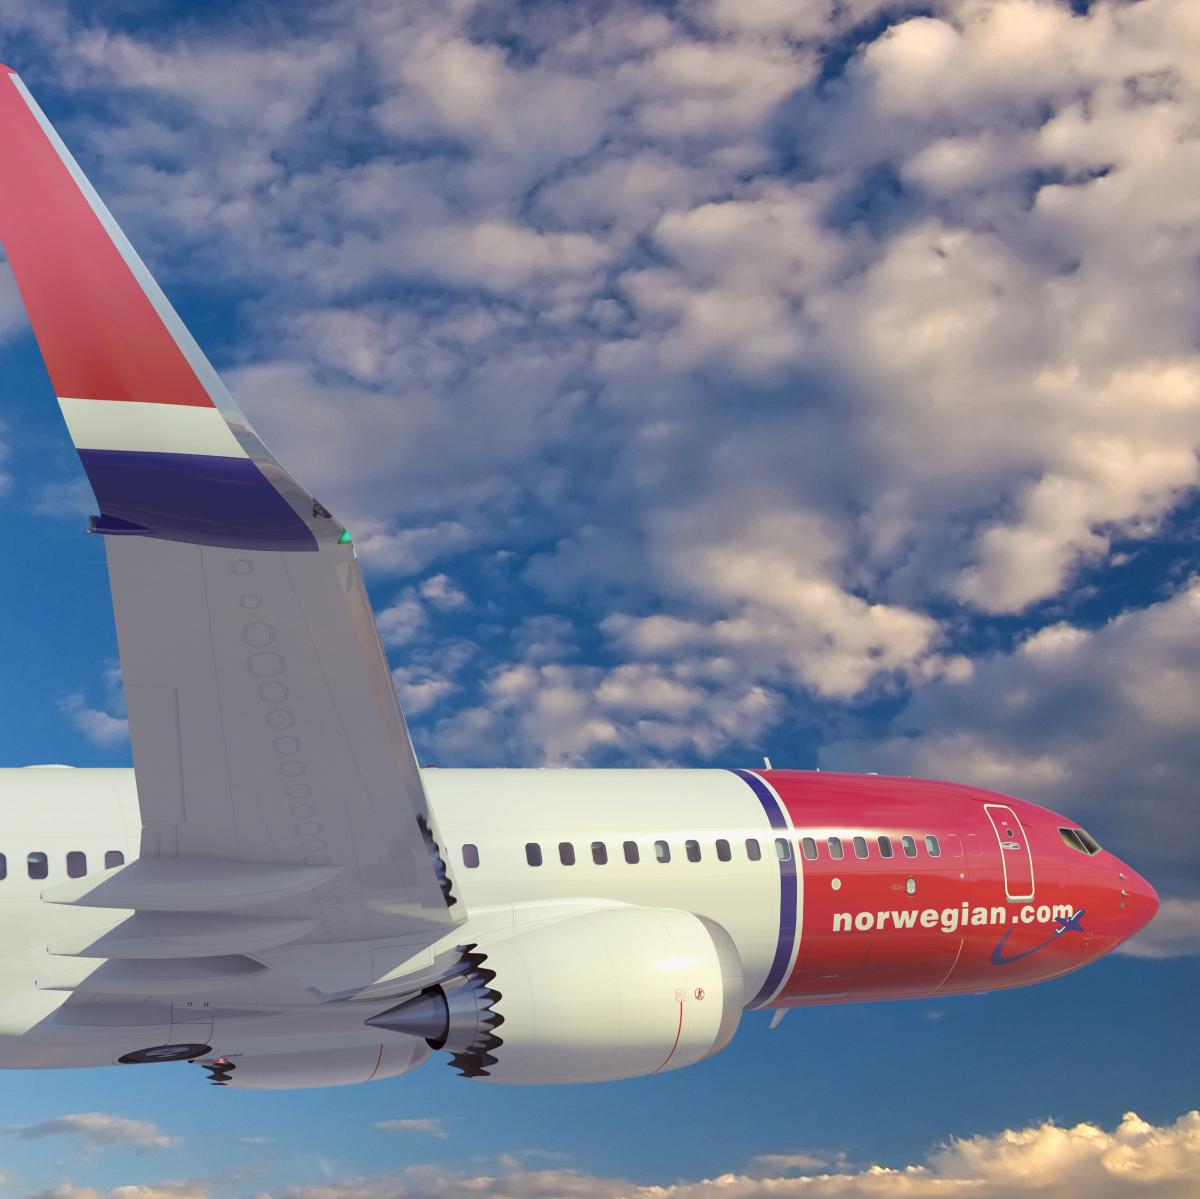 Norwegian airline plane Boeing 737 MAX8